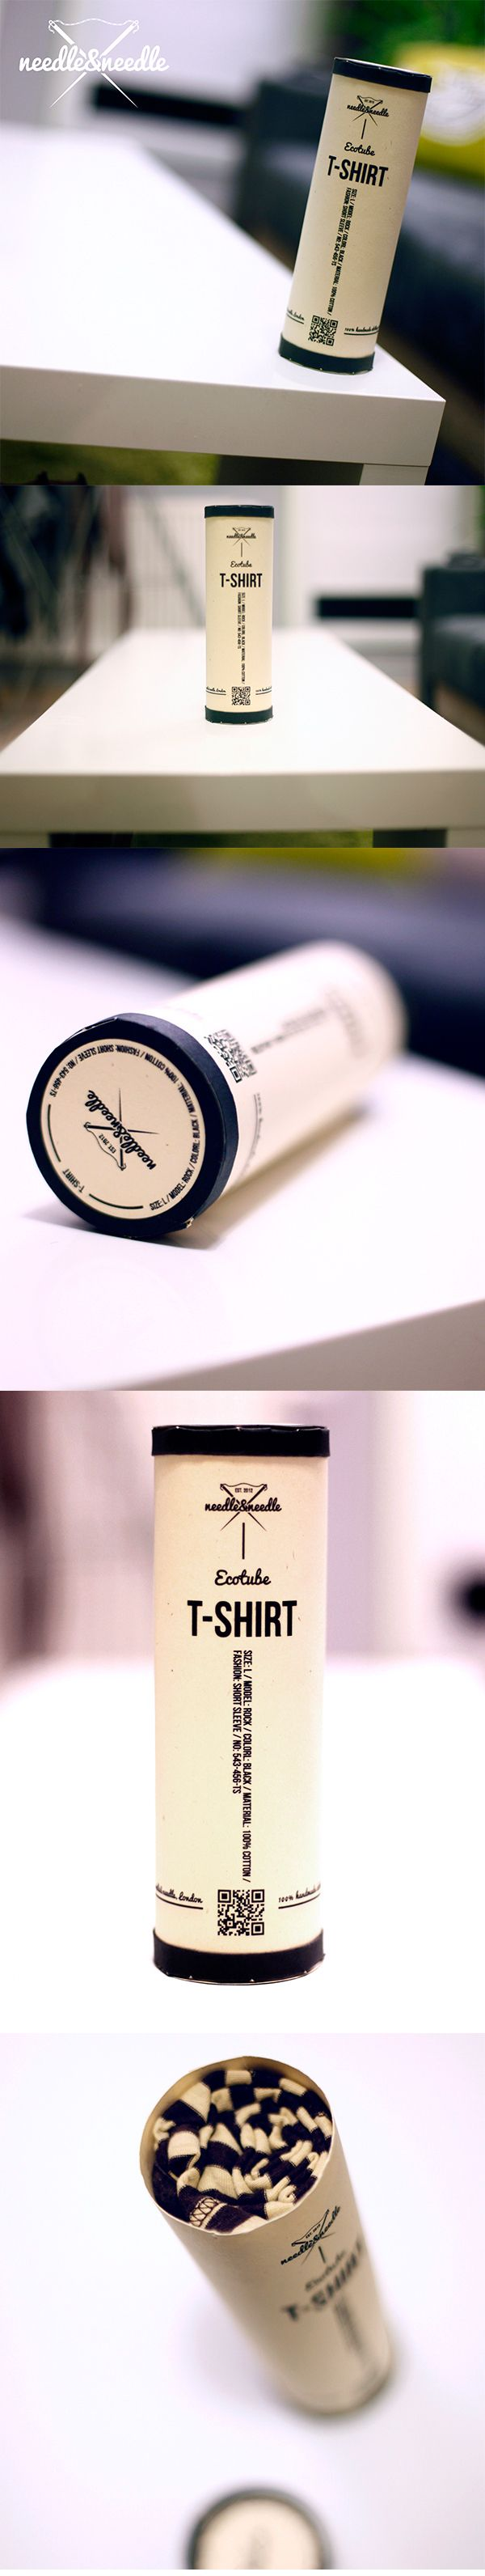 Shirt design examples - Tshirt Needle X Needle Packaging Design Fabric Inspiration